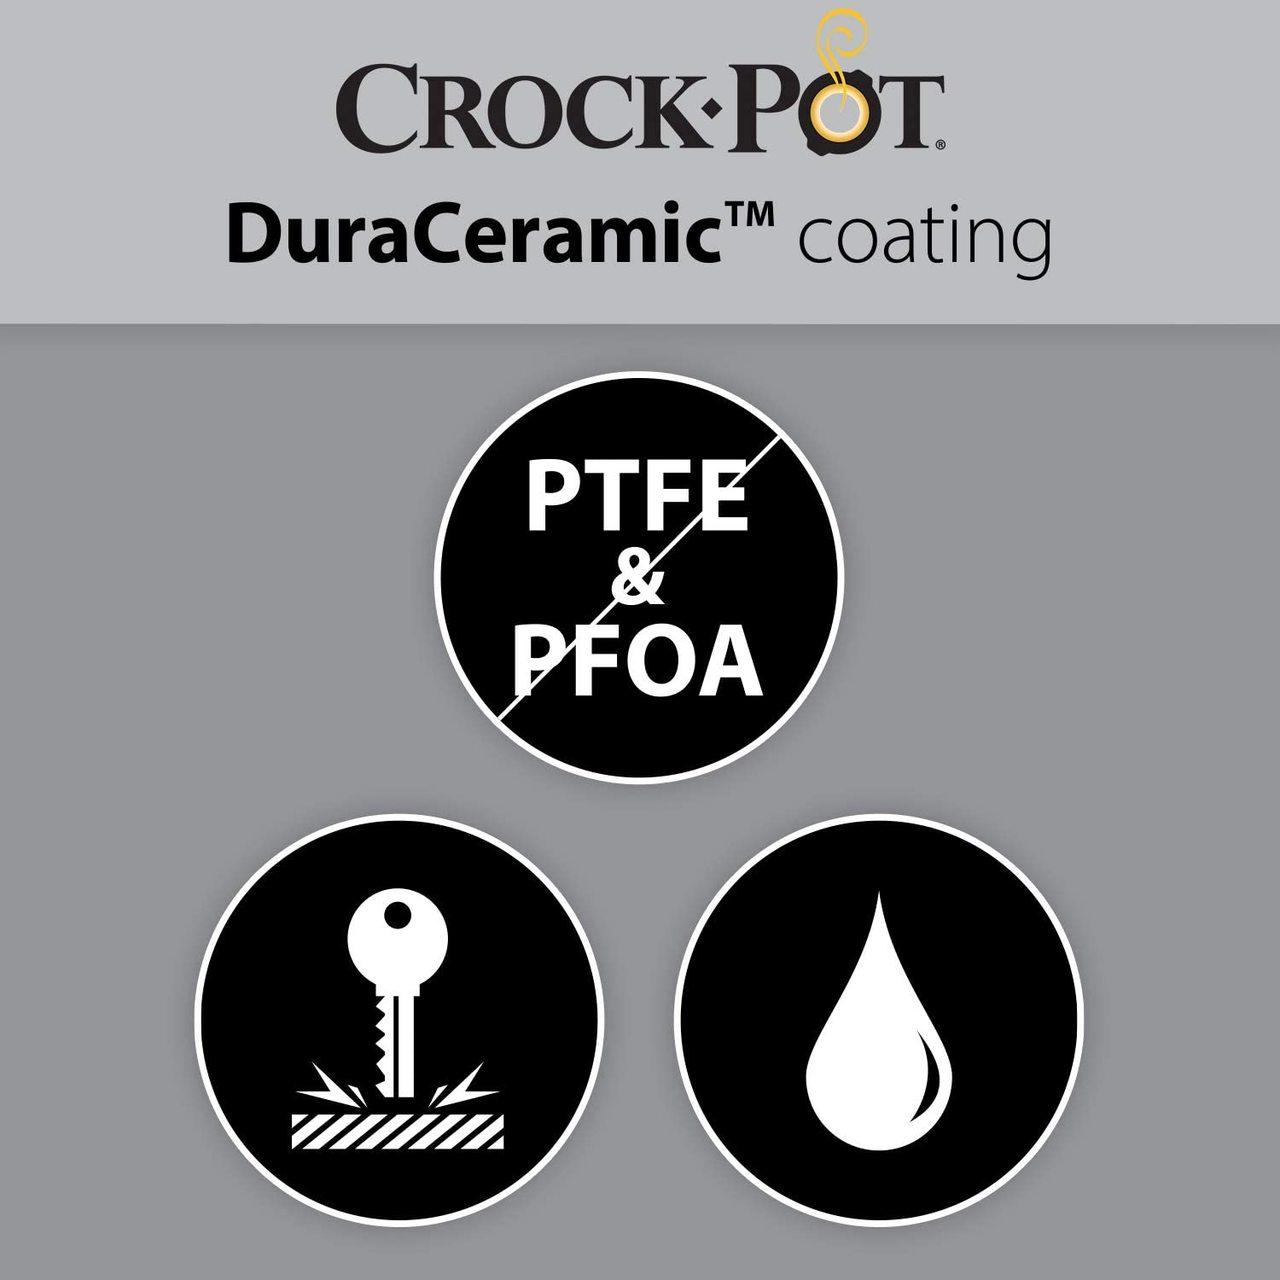 CROCK-POT SLOW COOKER DURACERAMIC WHITE 5.0L (For 6) (NEW)